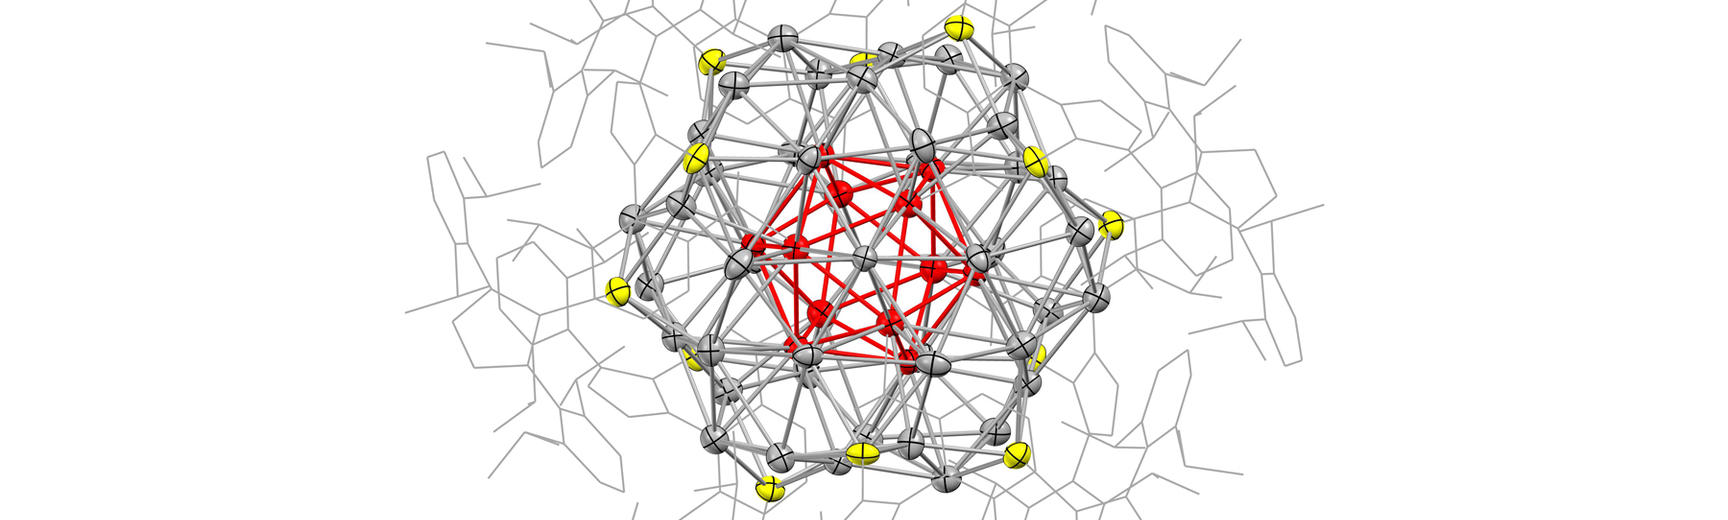 Andrey's In69 cluster